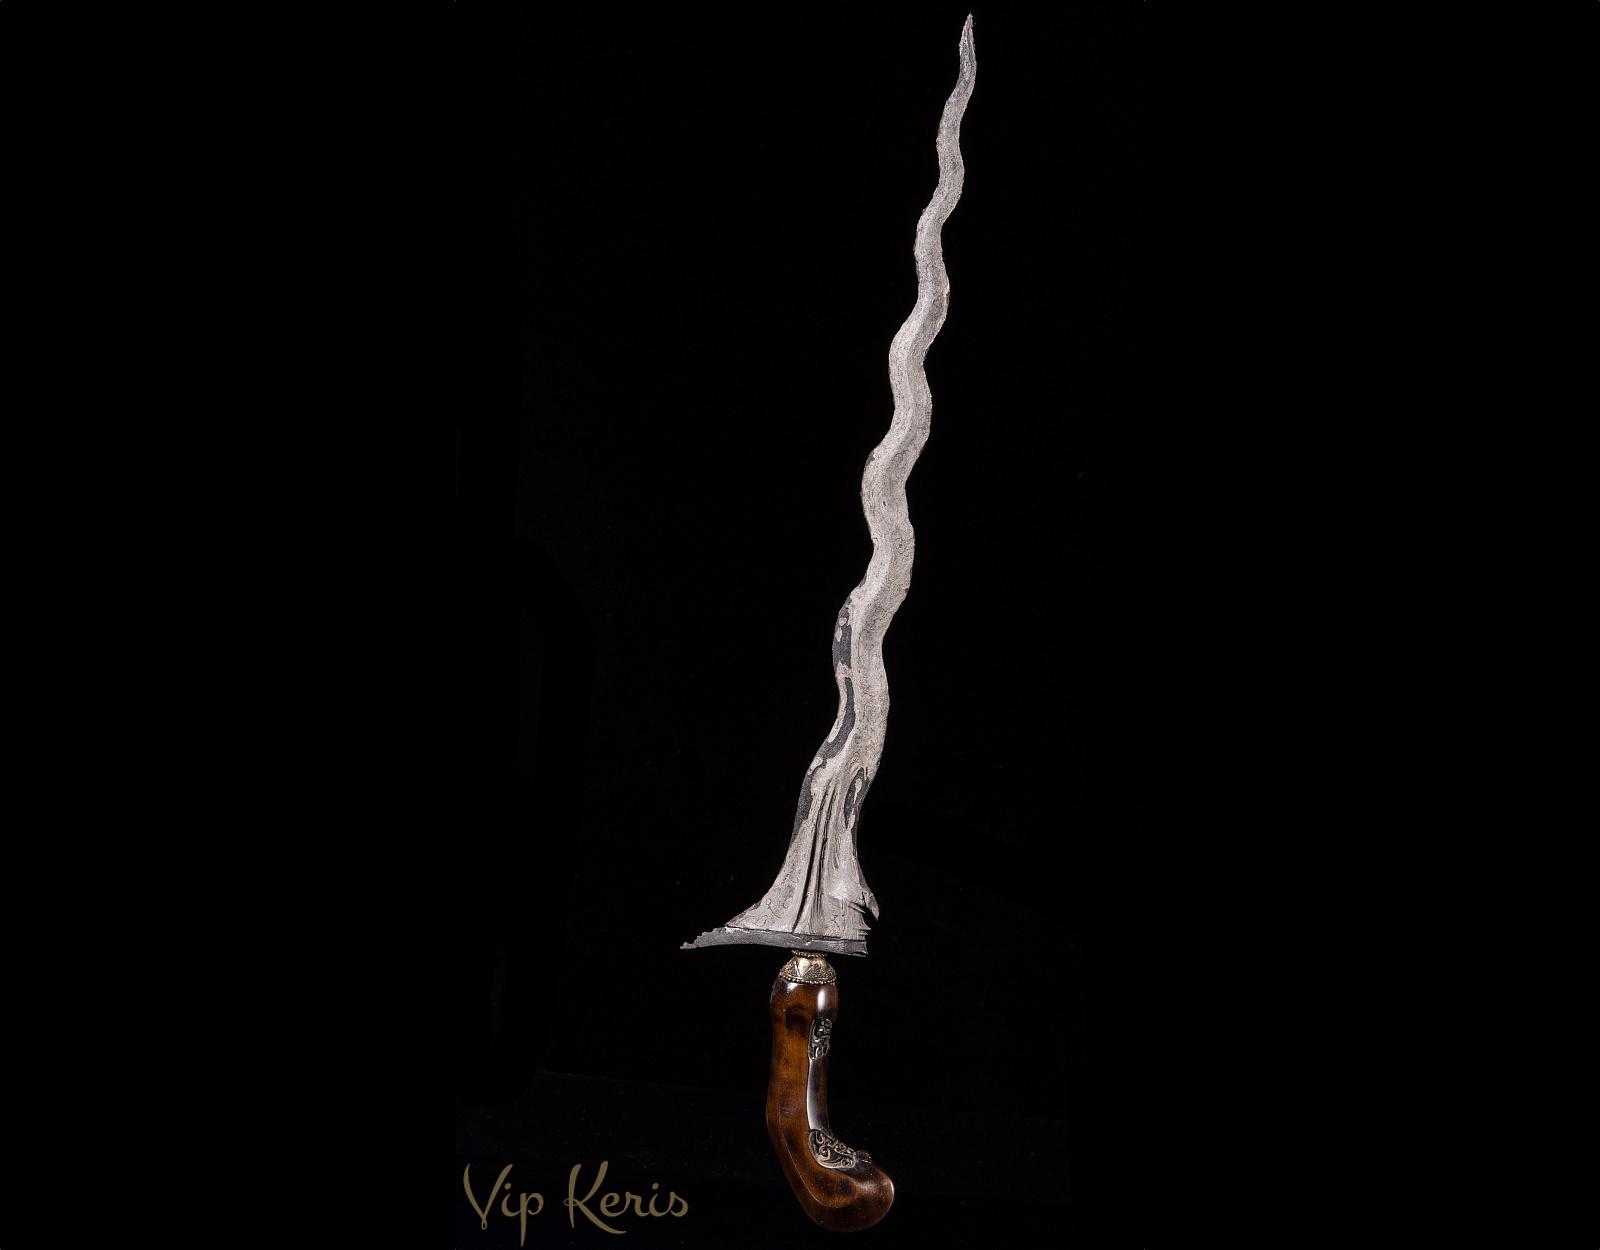 Кинжал Крис Parung Sari, Luk13 фото VipKeris